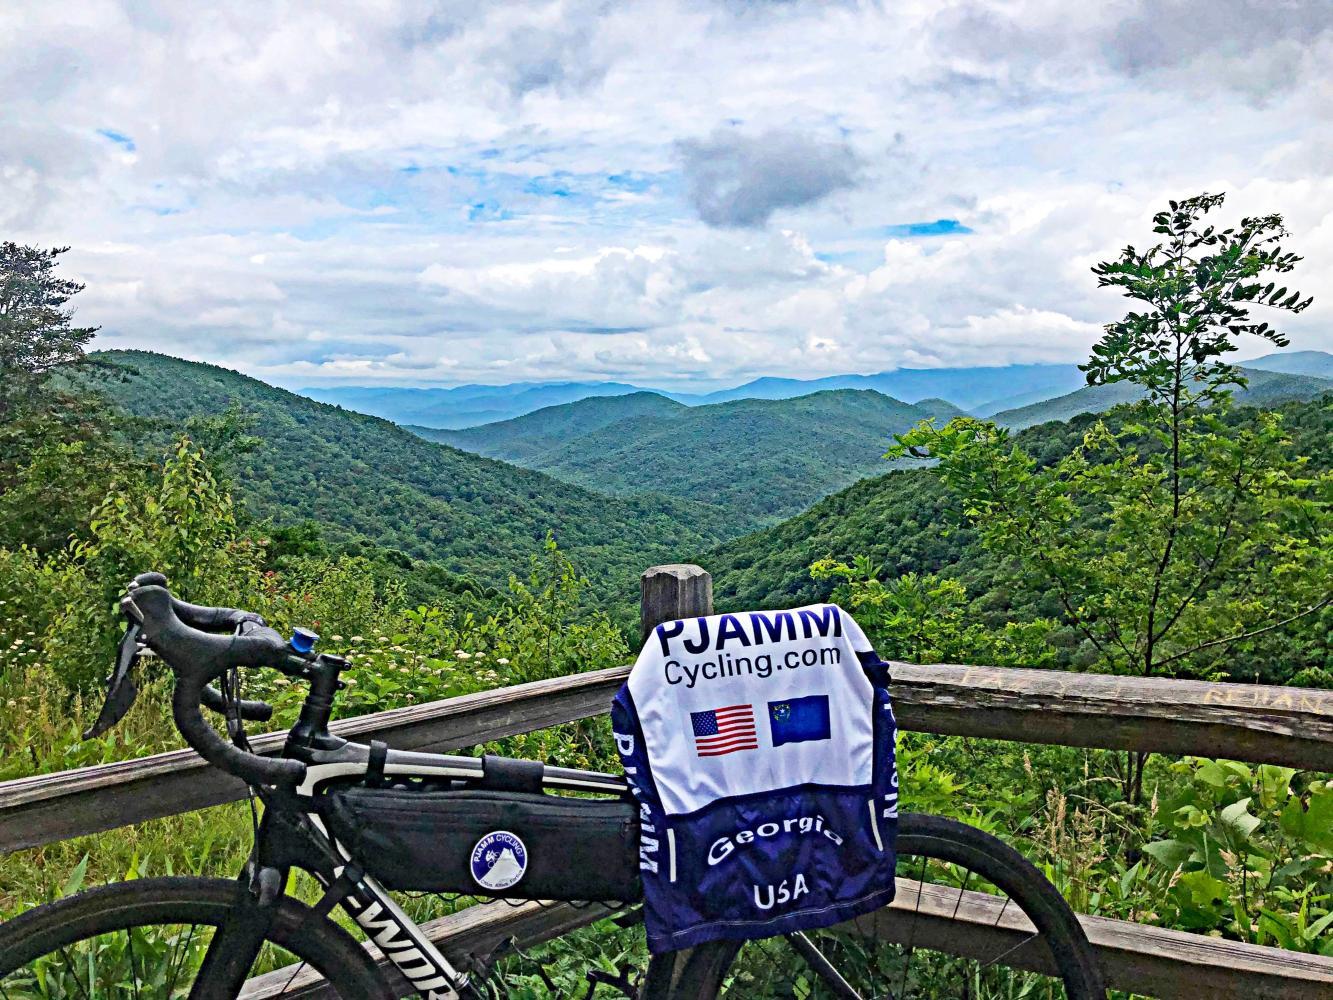 Hogpen Gap East Bike Climb - PJAMM Cycling